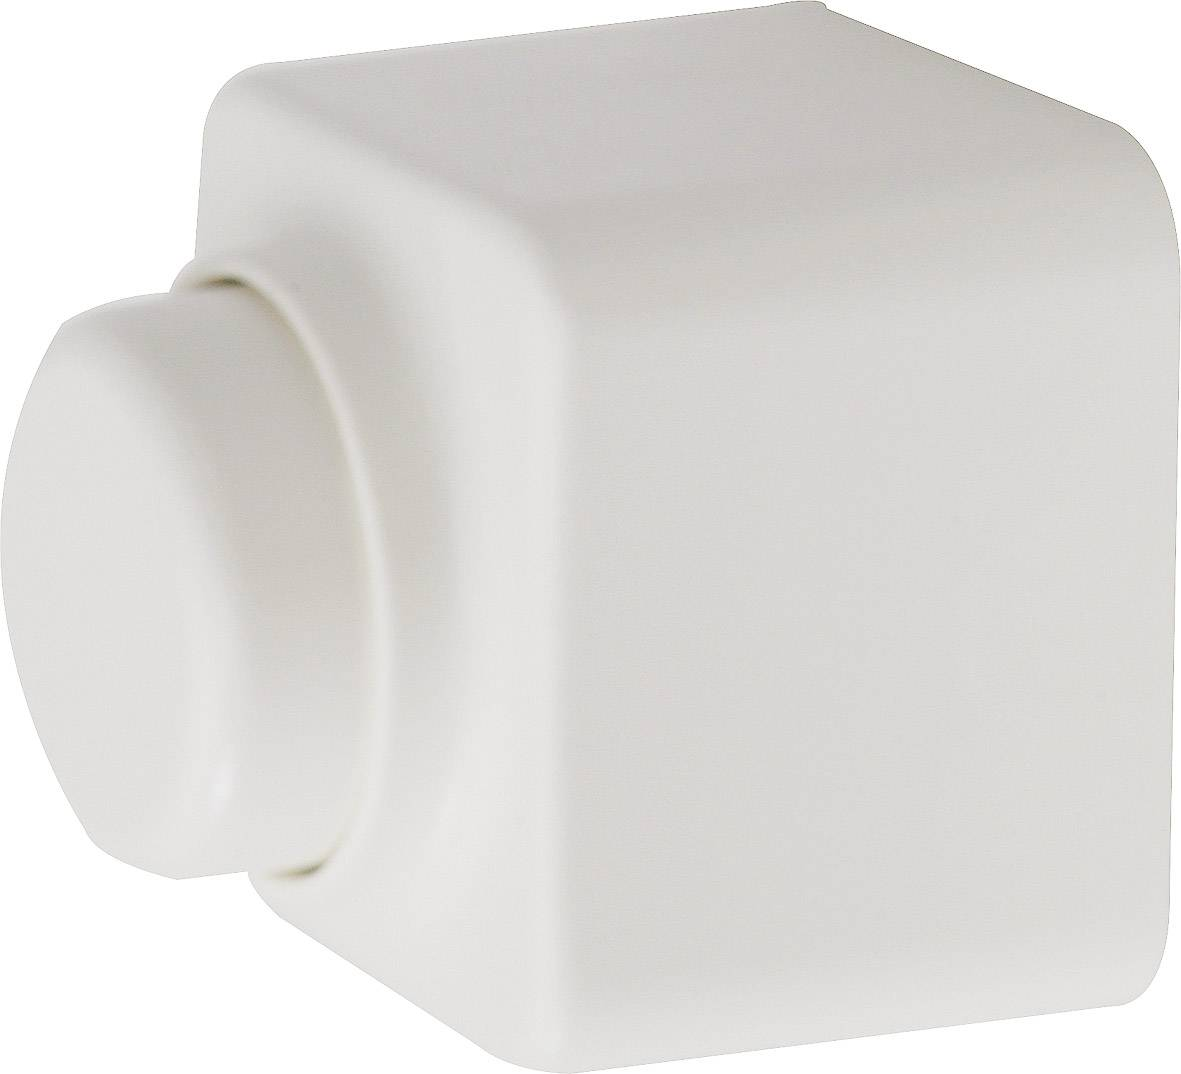 Stmievač na omietku Ehmann Lumeo Domus Ph-An 300W/VA AP 3061c0150, čisto biela